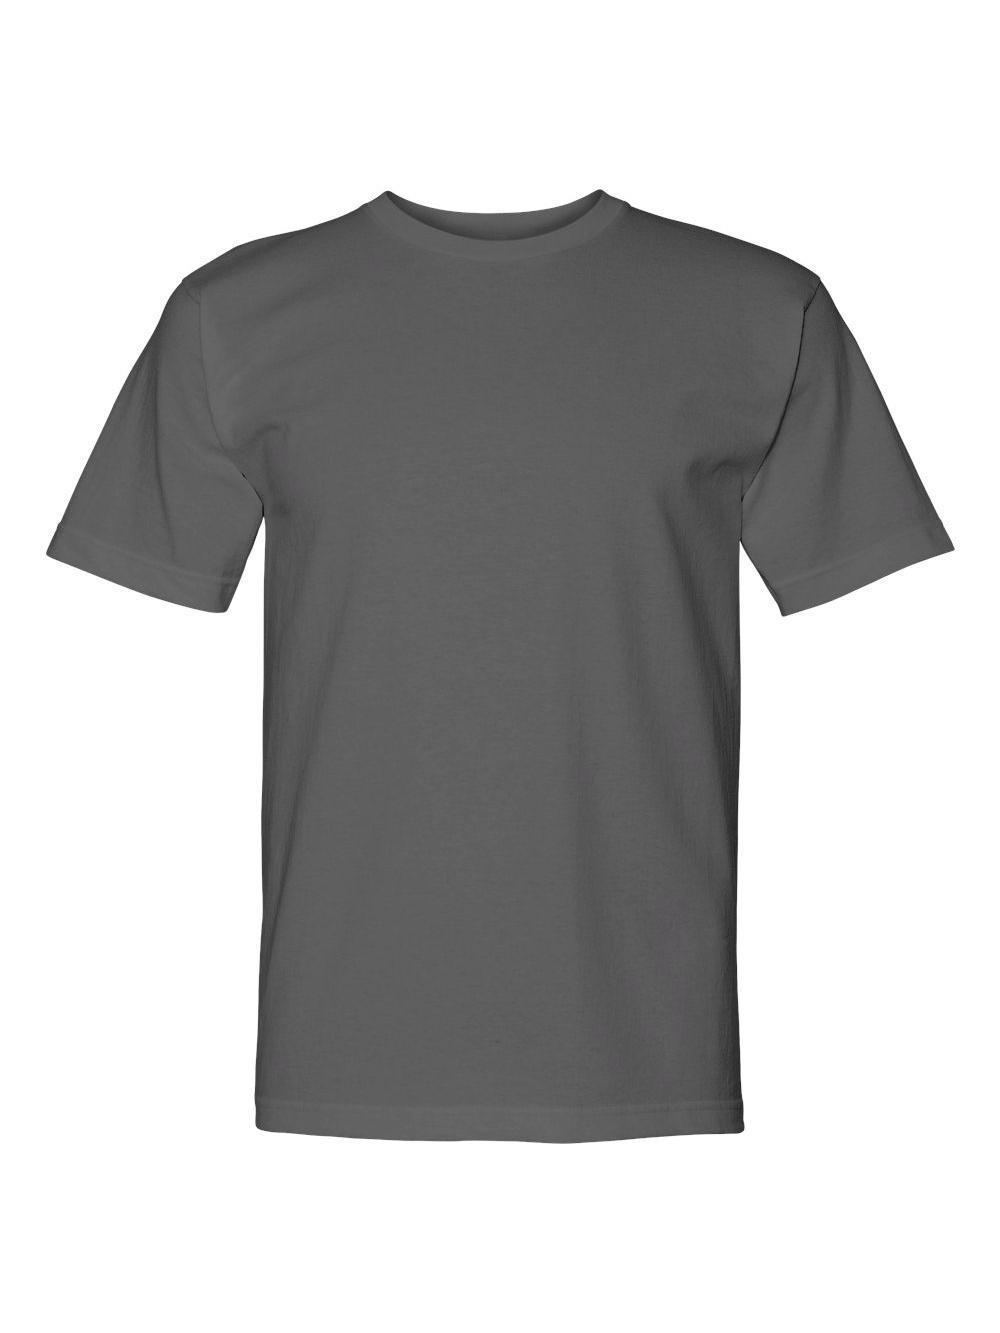 Bayside-USA-Made-100-Cotton-Short-Sleeve-T-Shirt-5040 thumbnail 9